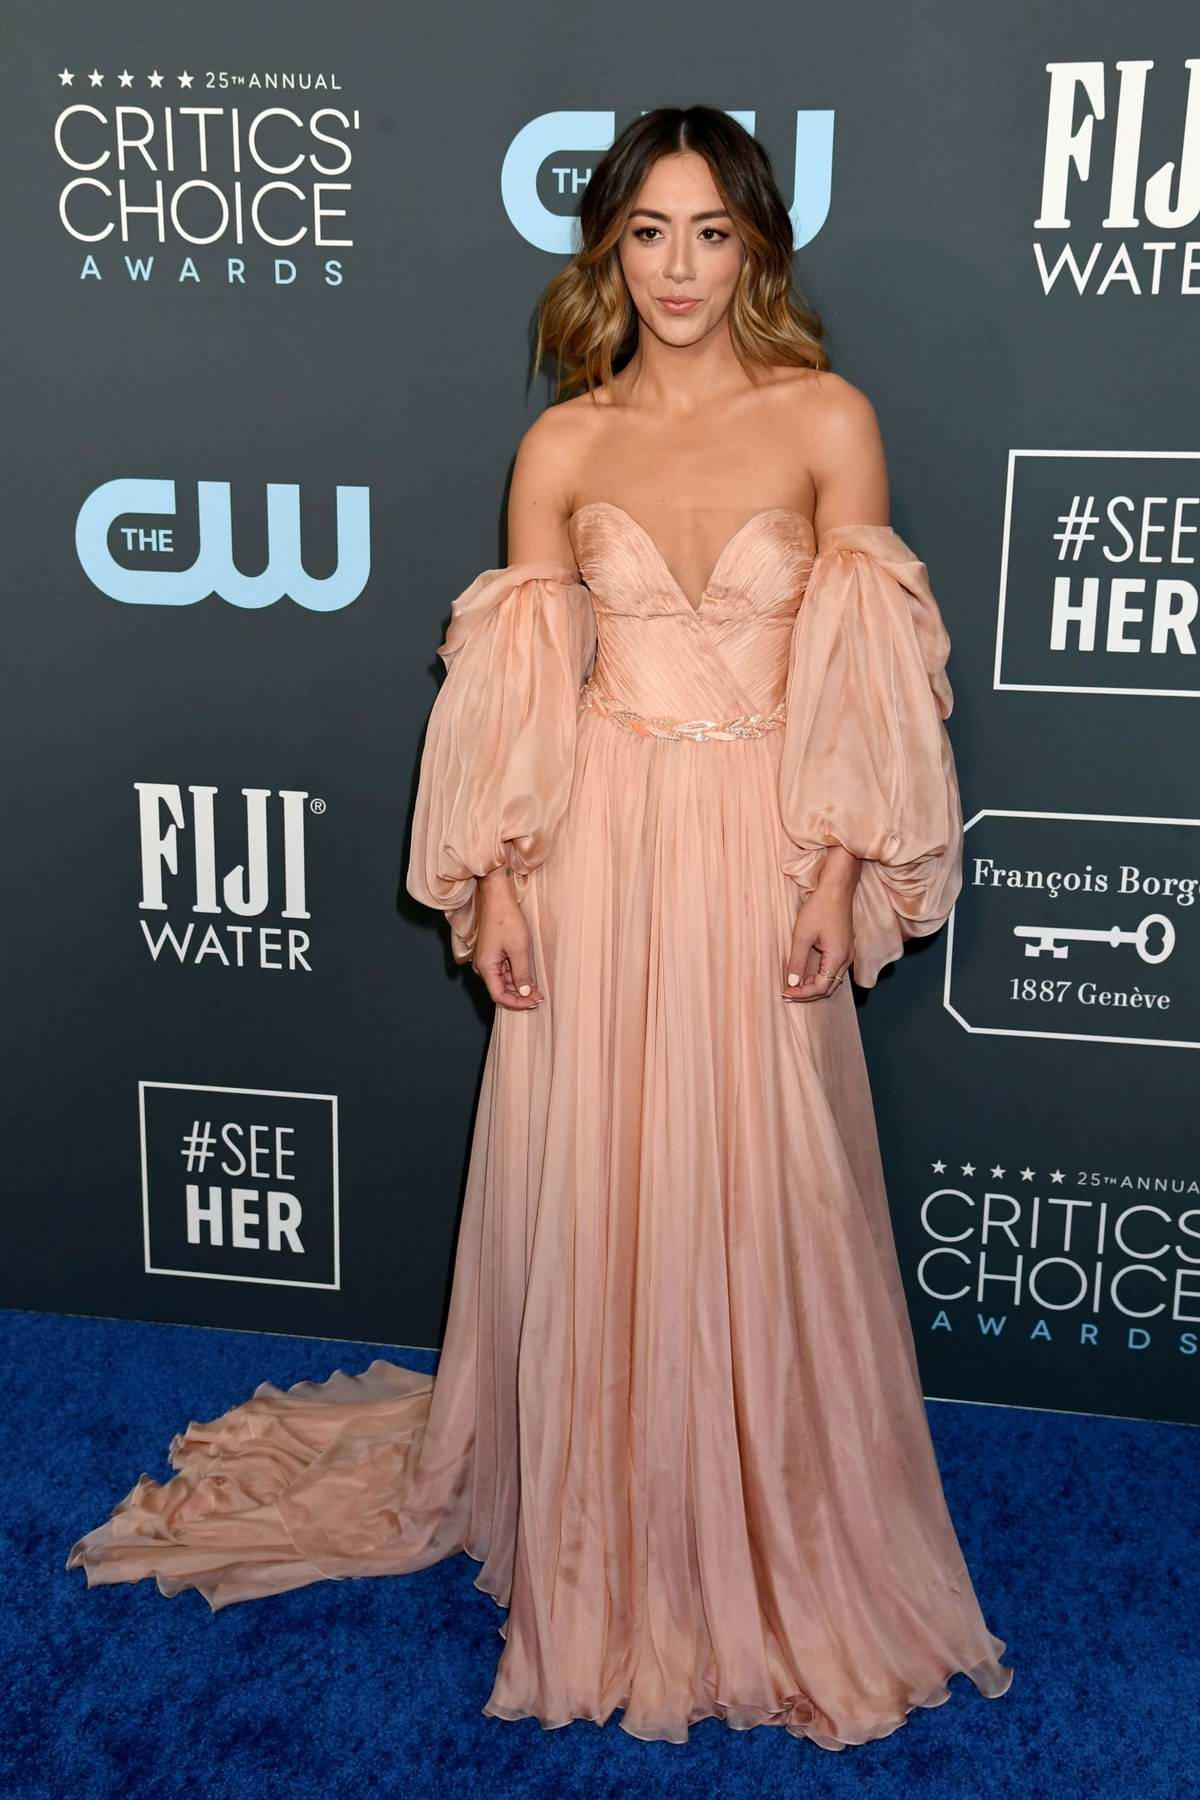 Chloe Bennet attends the 25th Annual Critics' Choice Awards at Barker Hangar in Santa Monica, California